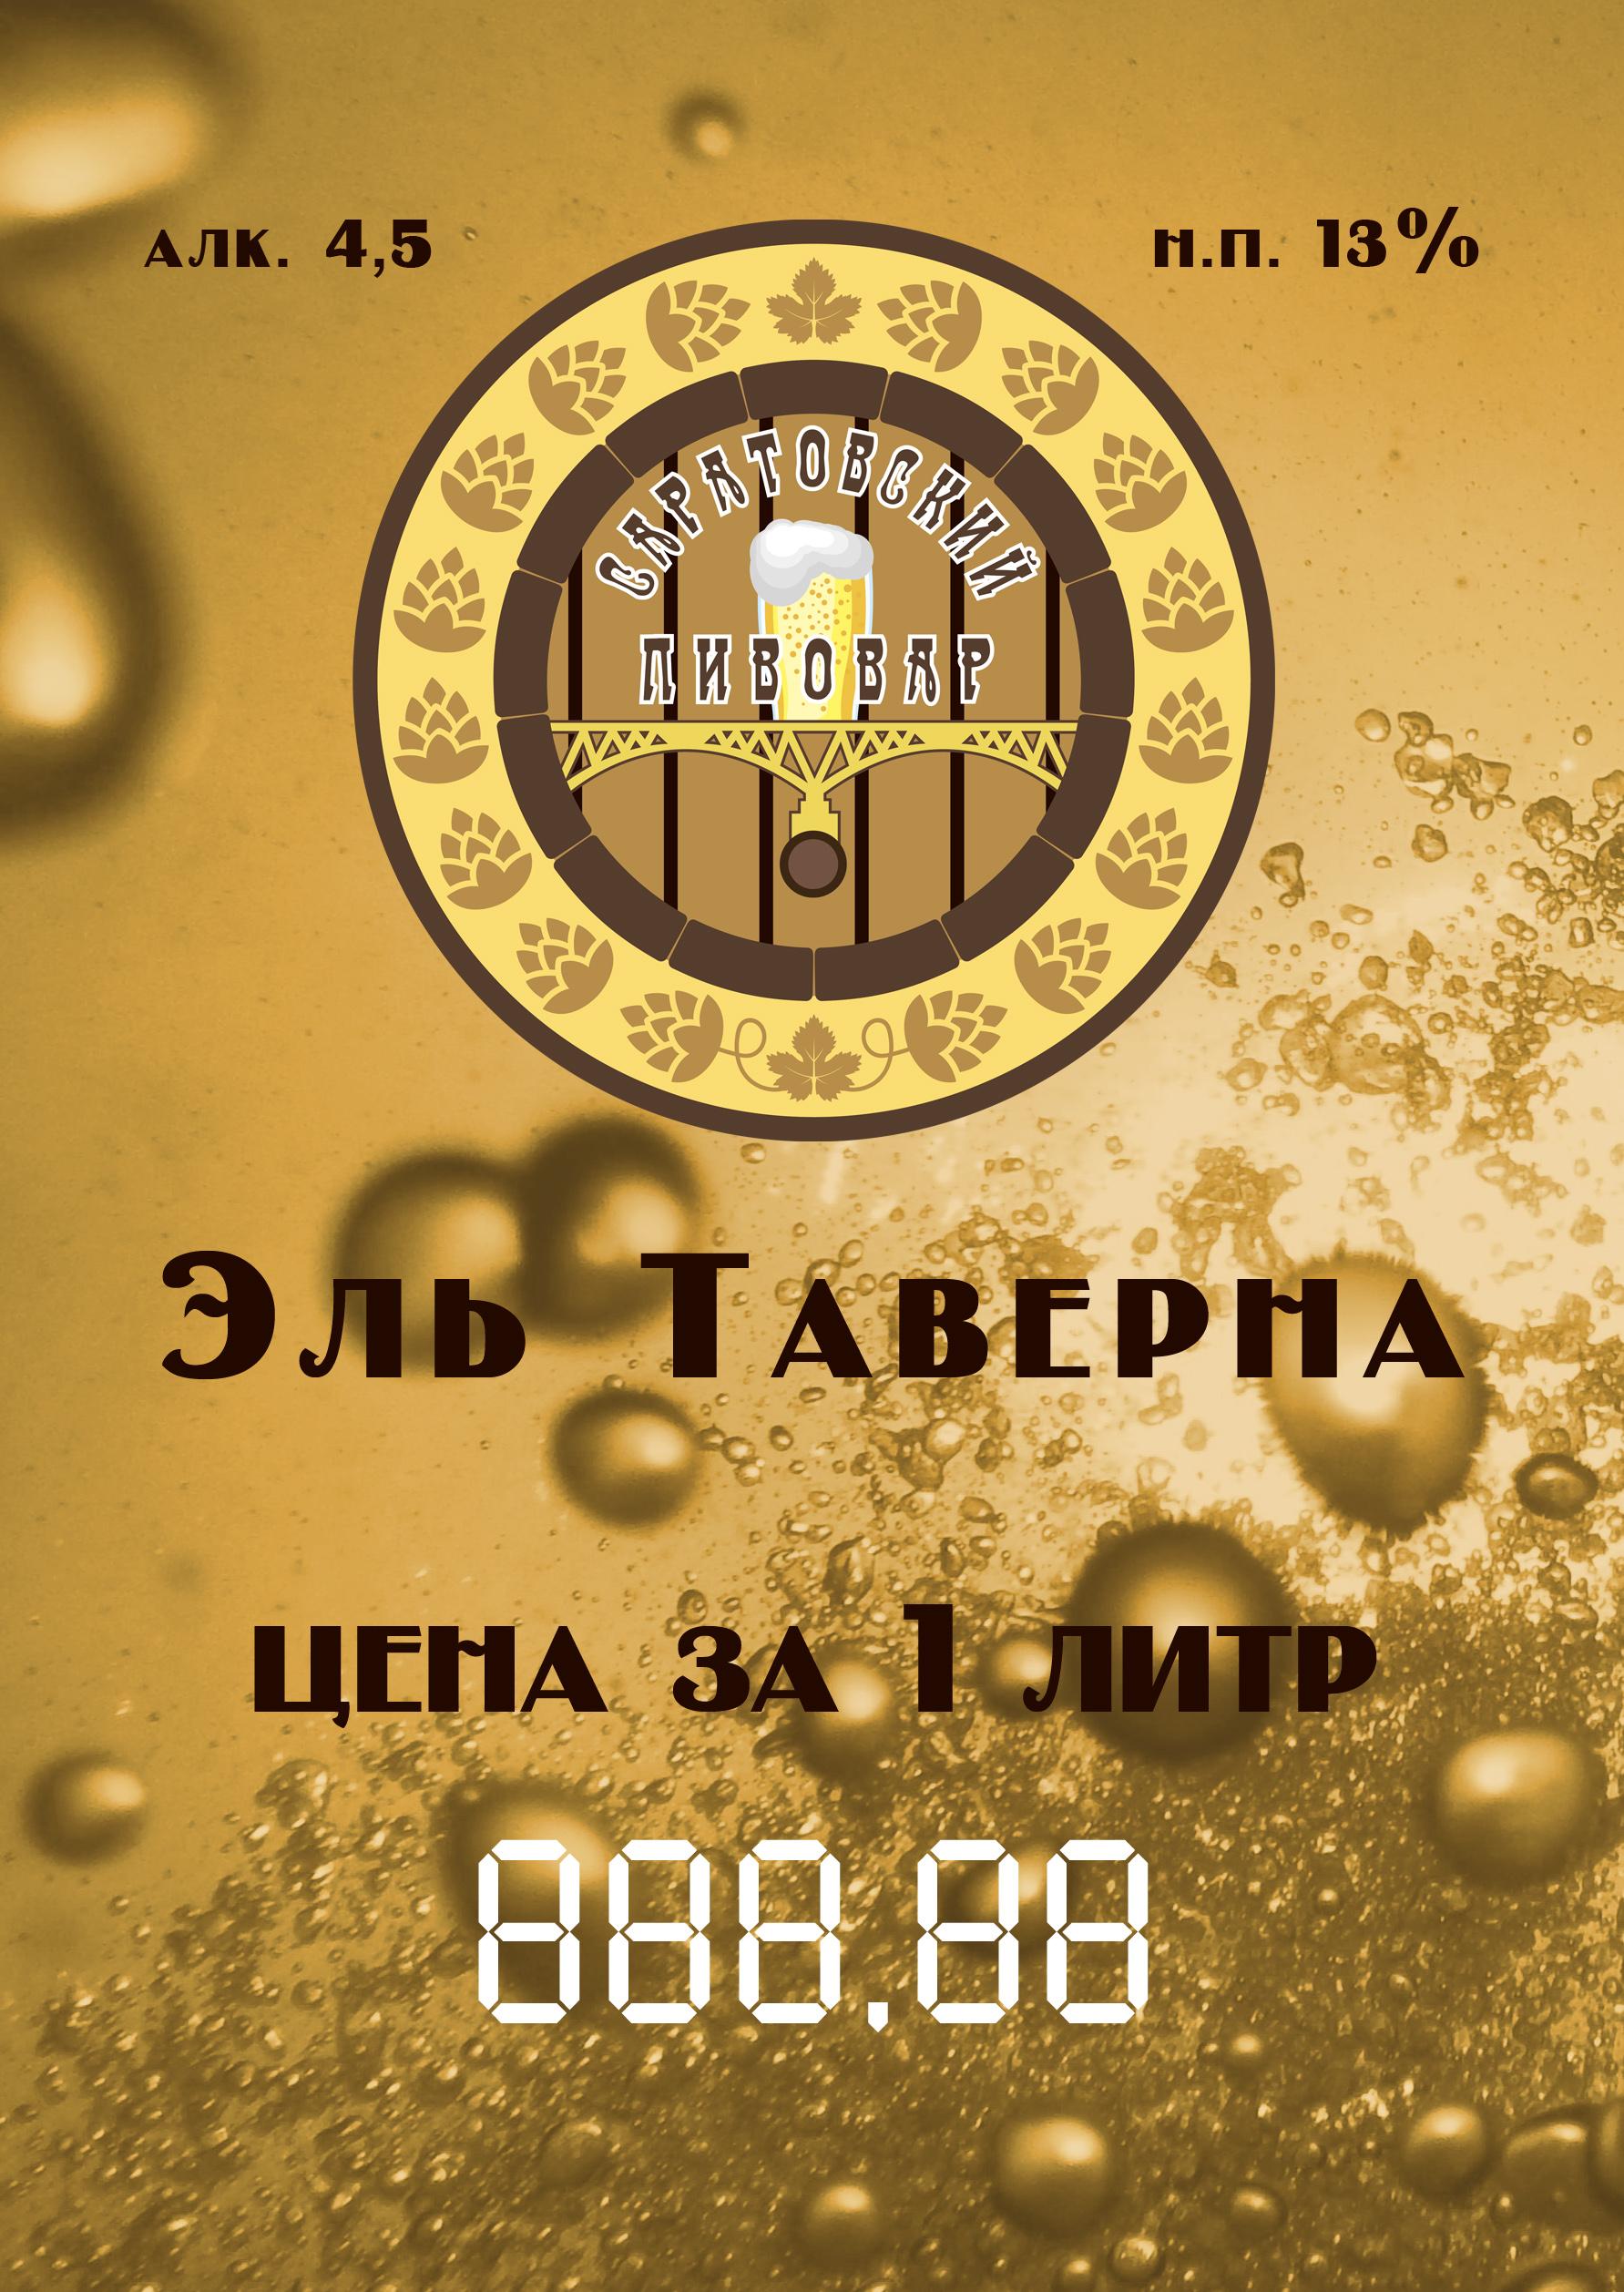 Разработка логотипа для частной пивоварни фото f_8105d7a14ecbf0f2.jpg